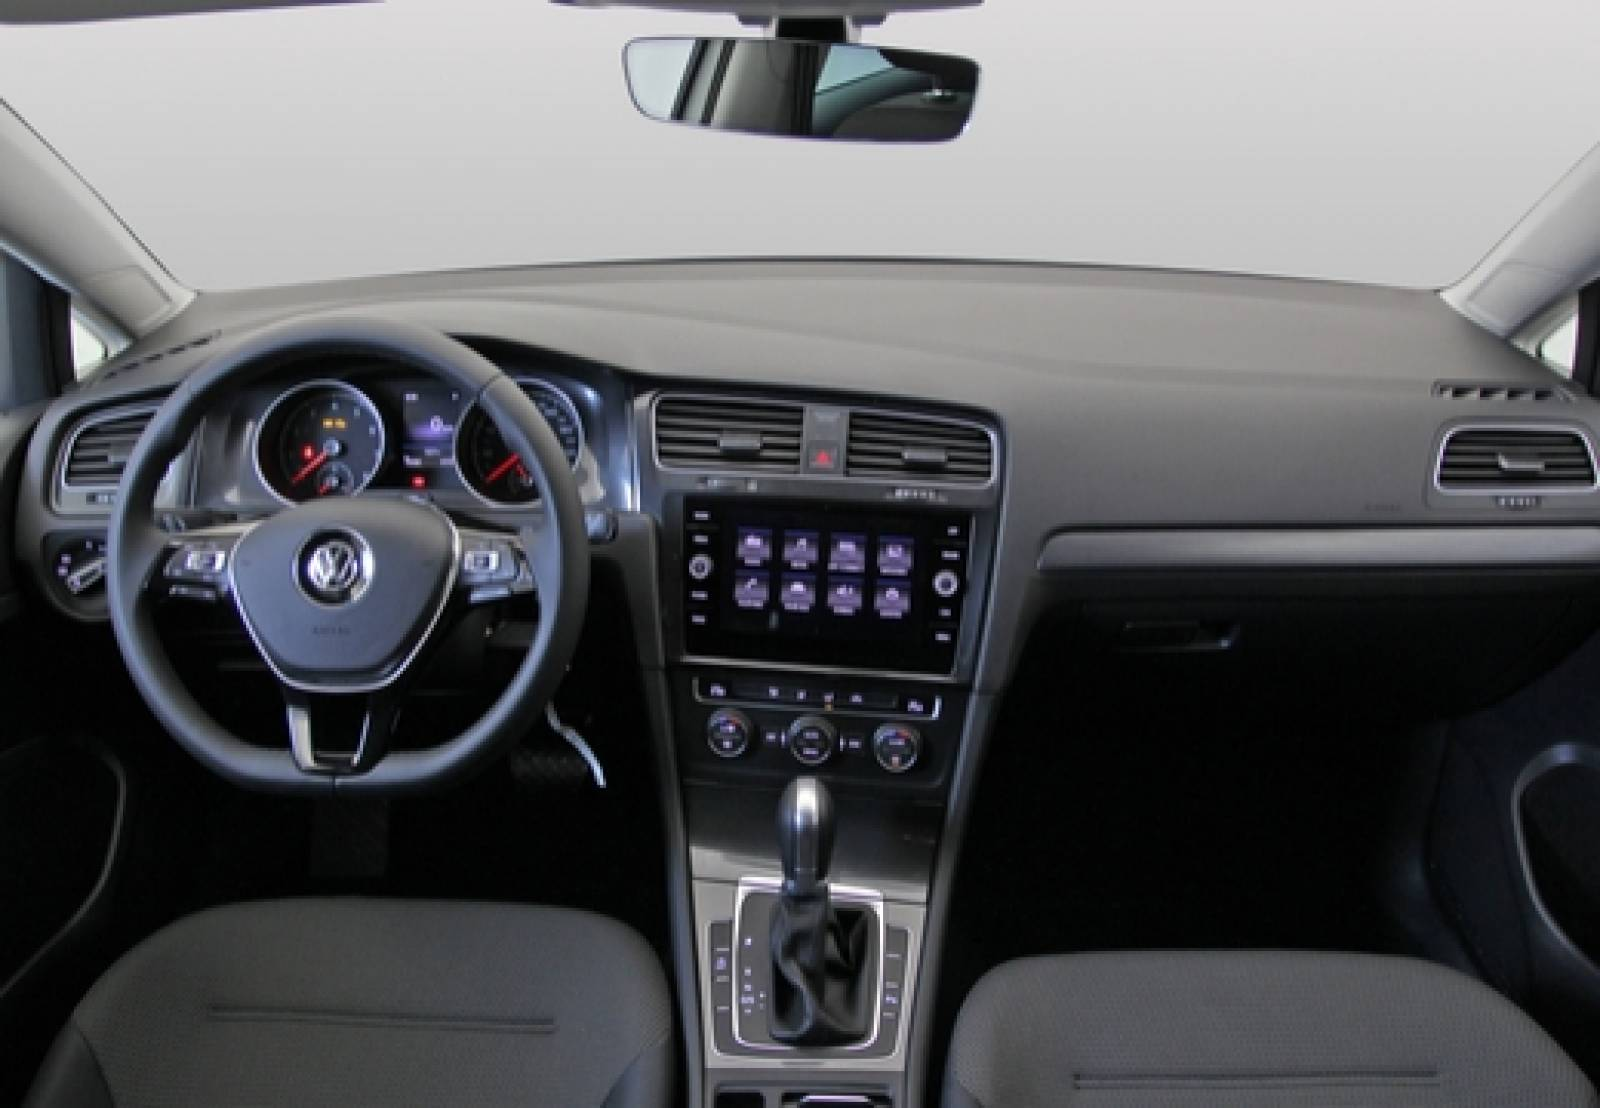 VOLKSWAGEN Golf 1.5 TSI 150 EVO DSG7 - véhicule neuf - LEMAUVIEL AUTOMOBILES - Présentation site web V2 - Lemauviel Automobiles - VIRE - 14500 - VIRE - 9